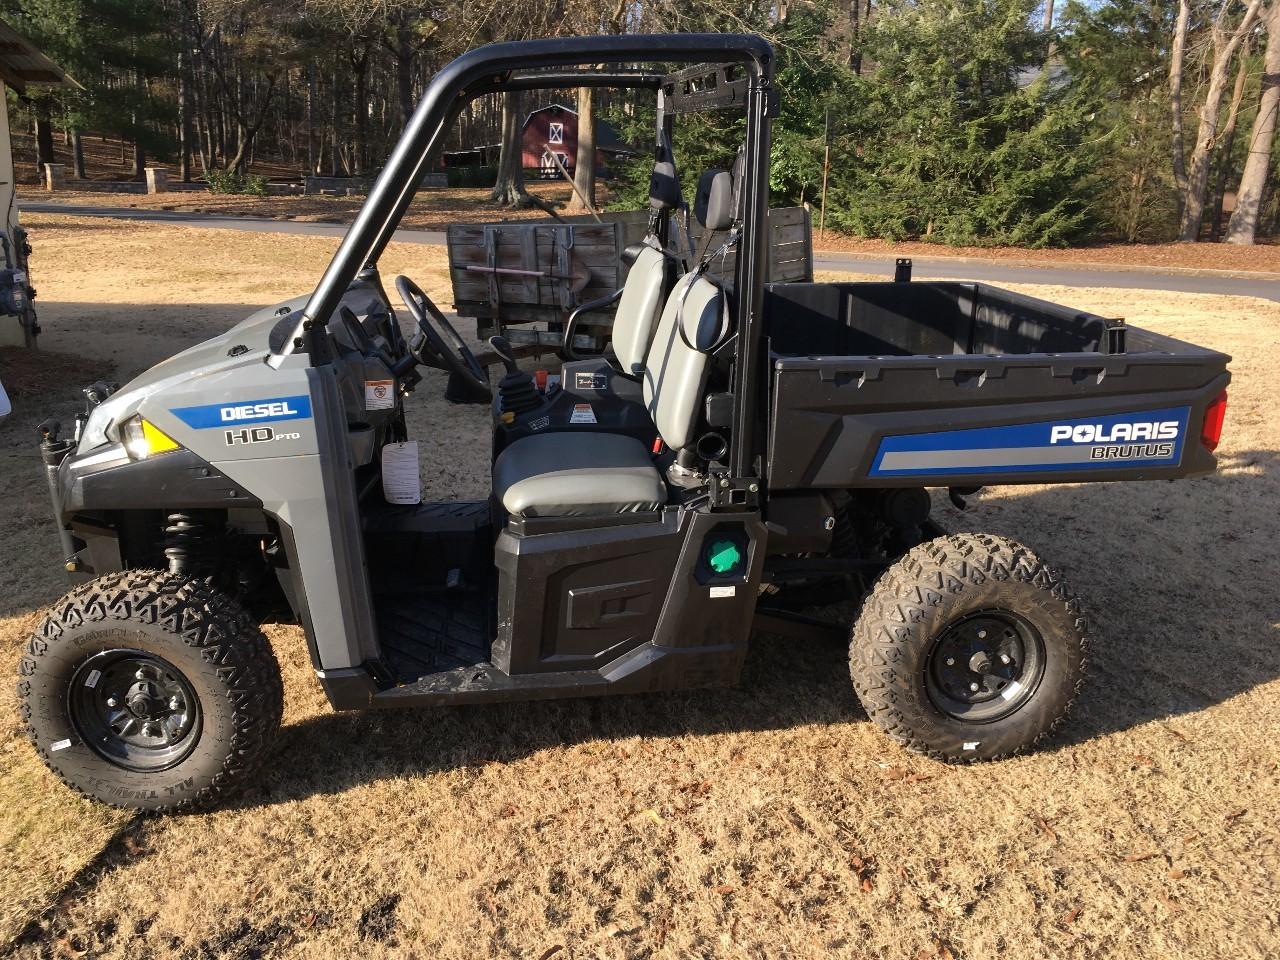 Brutus Hd Pto For Sale - Polaris Four Wheeler ATVs - ATV Trader